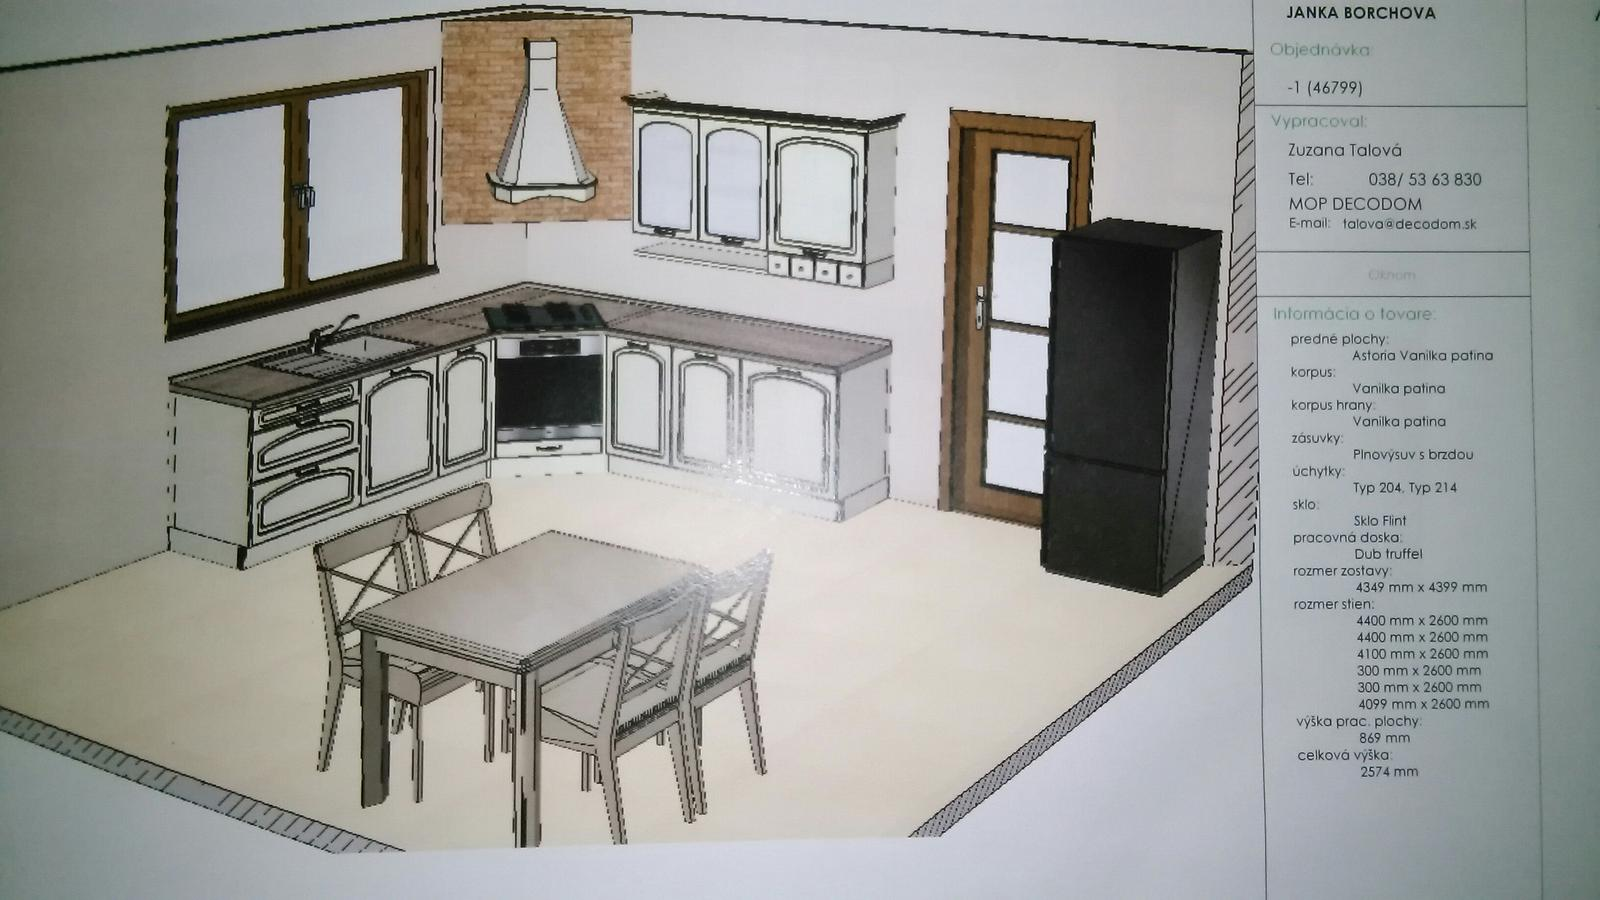 U nas DOMA   👪💟 - kuchyna navrhnuta :)